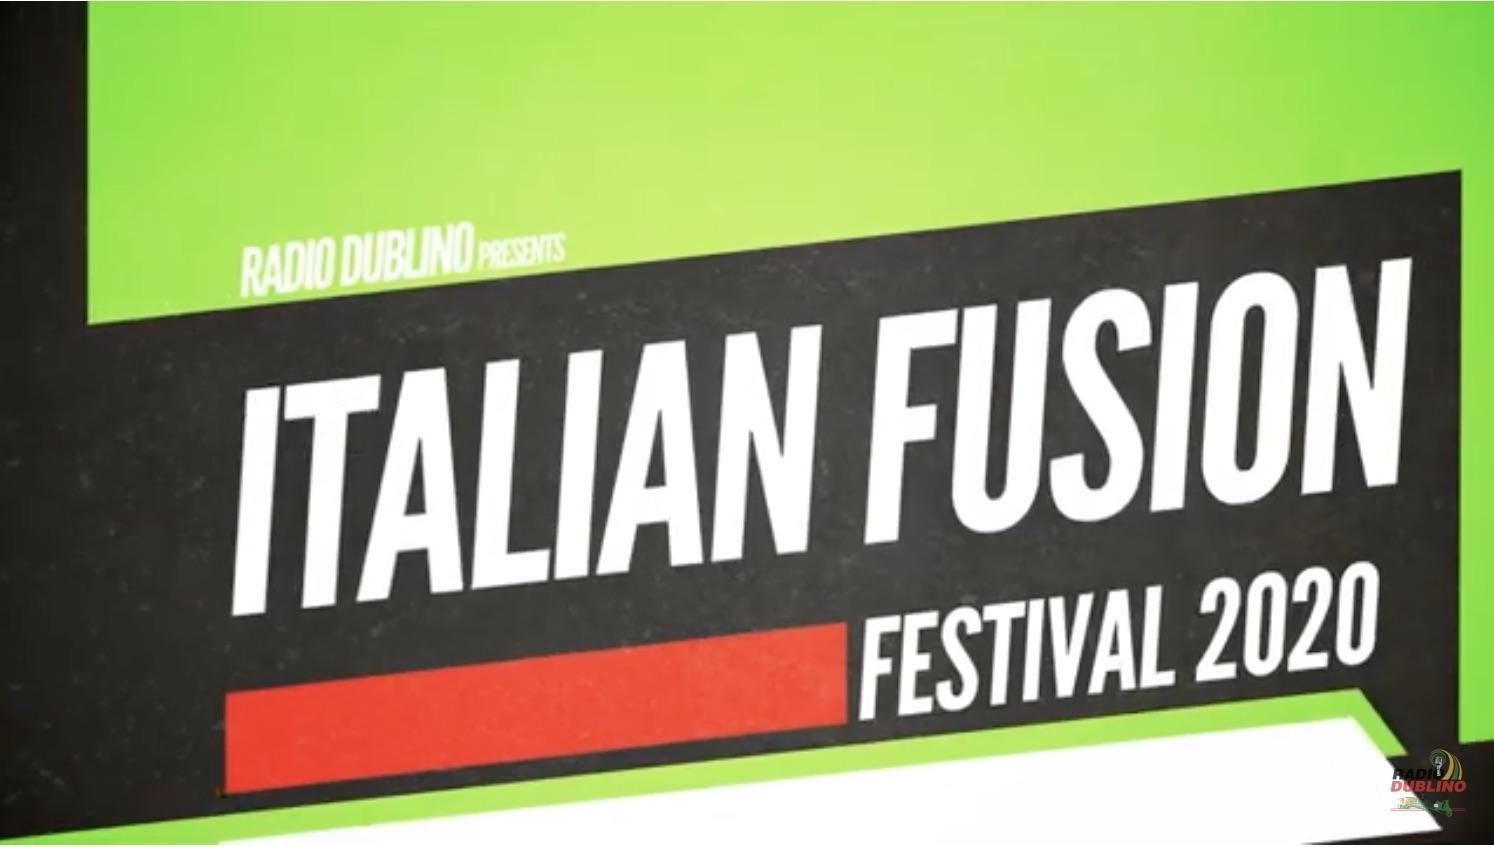 Italian Fusion Festival 2020 | Livestream Edition